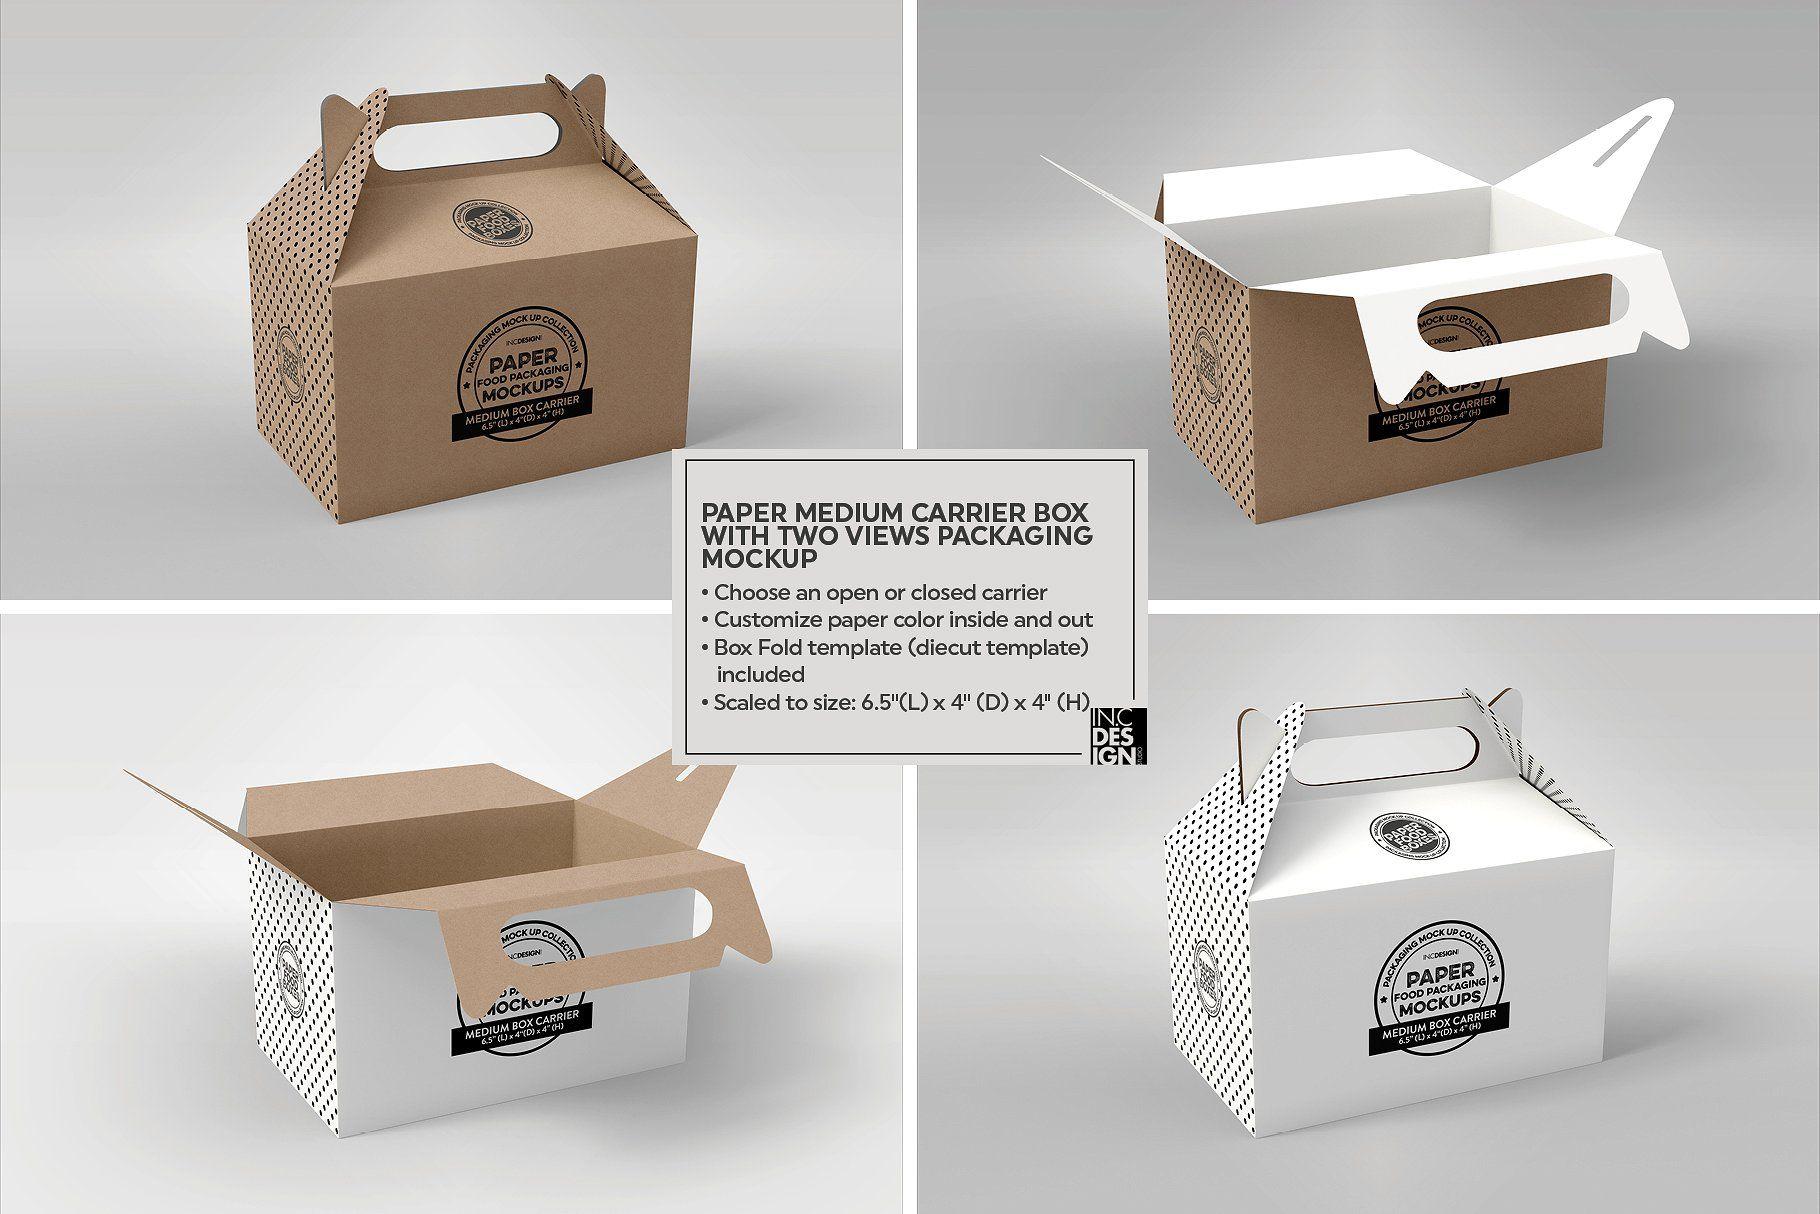 Vol 13 Food Box Packaging Mockups Food Box Packaging Packaging Mockup Packaging